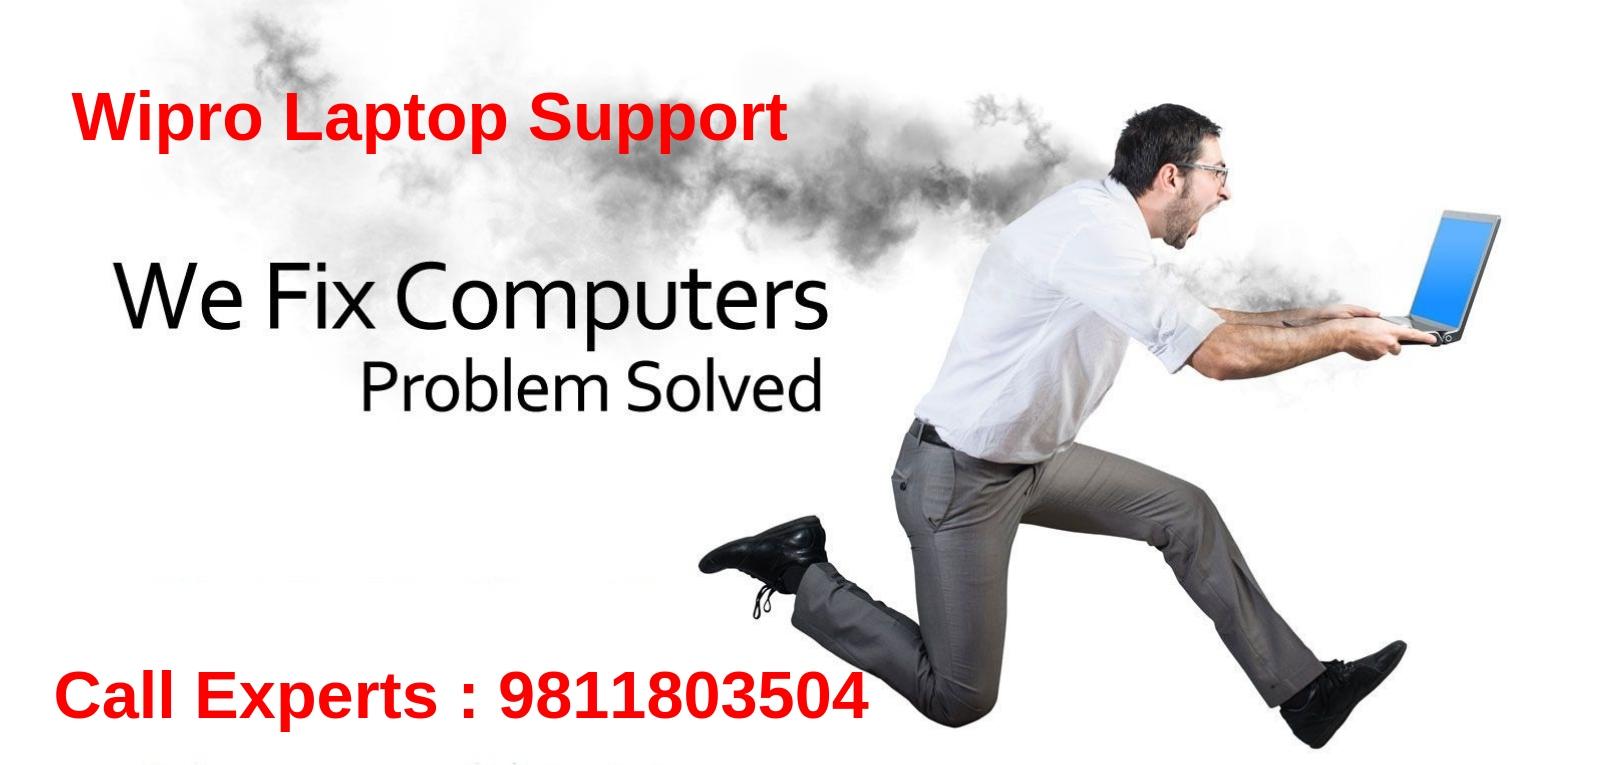 Wipro laptop Service & Repair in Delhi, Gurgaon, Noida, Ghazaibad & Delhi NCR